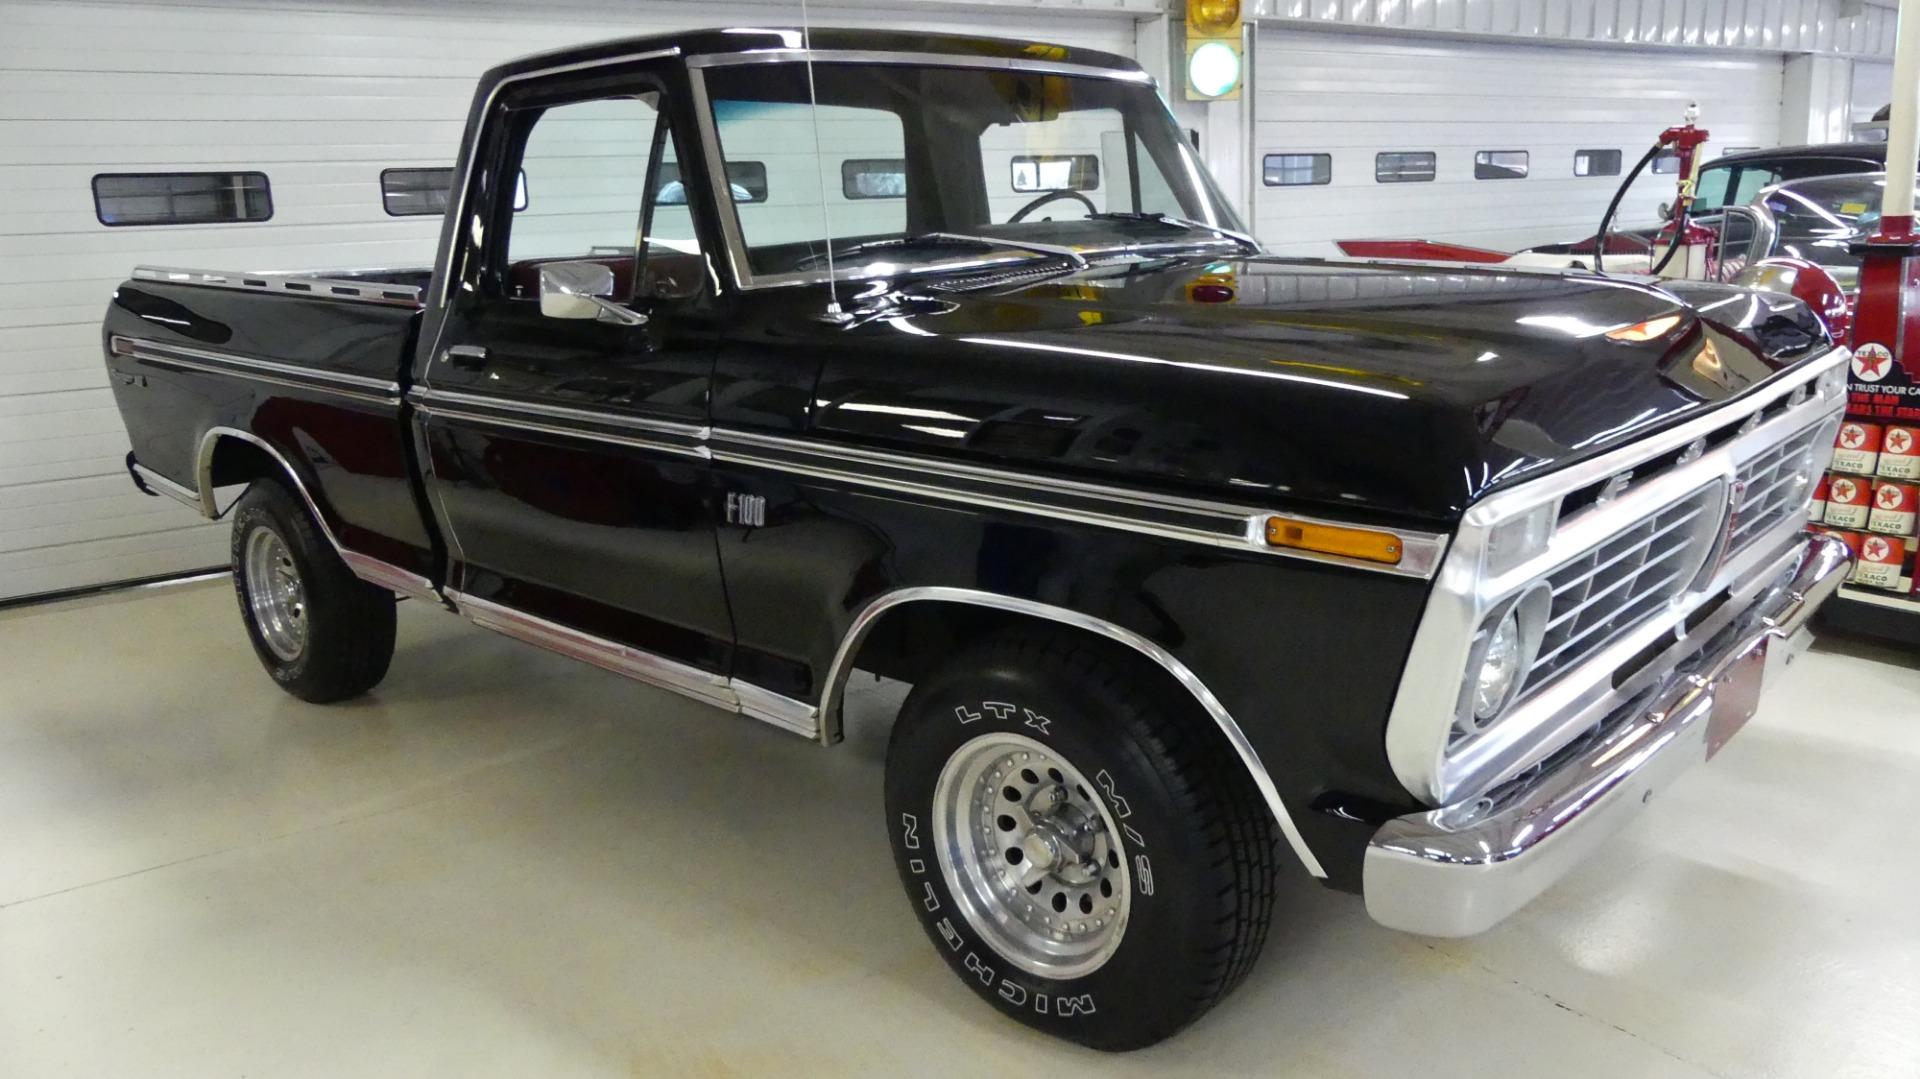 Groovy 1973 Ford F100 Ranger Xlt Stock R90835 For Sale Near Columbus Oh Wiring Cloud Monangrecoveryedborg